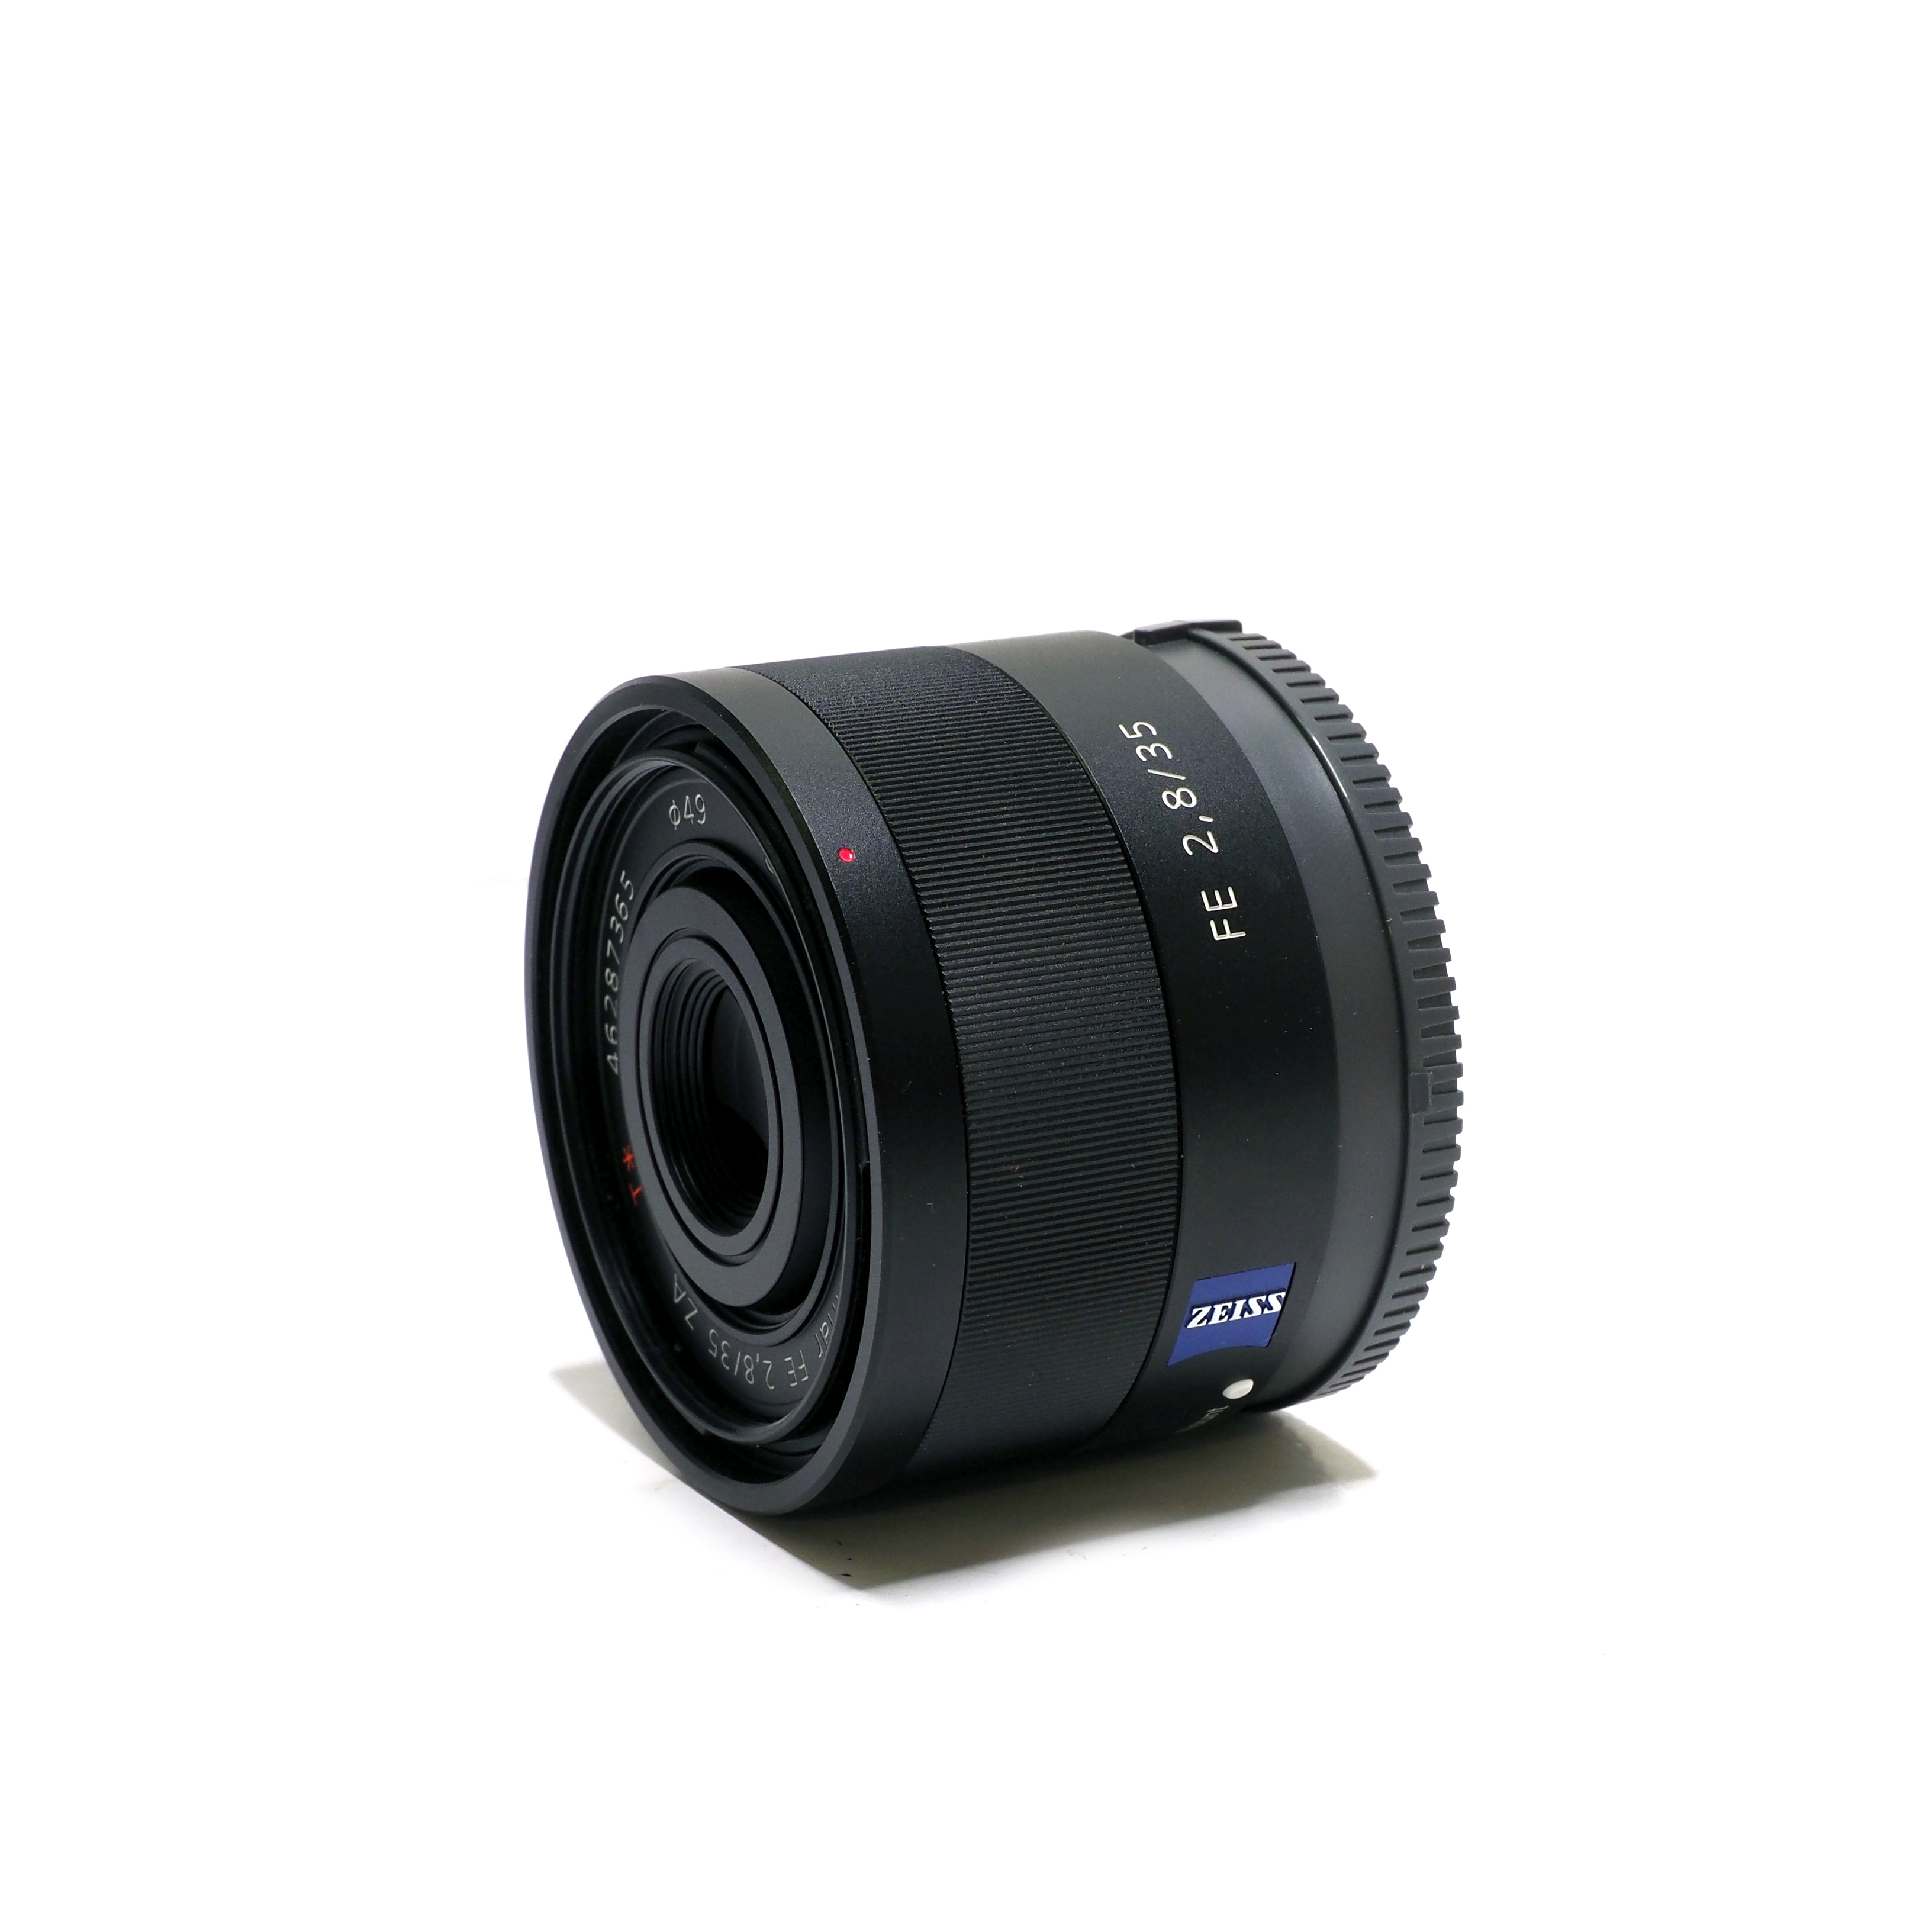 Sony FE Zeiss Sonnar T* 35mm f/2.8 - BEGAGNAT